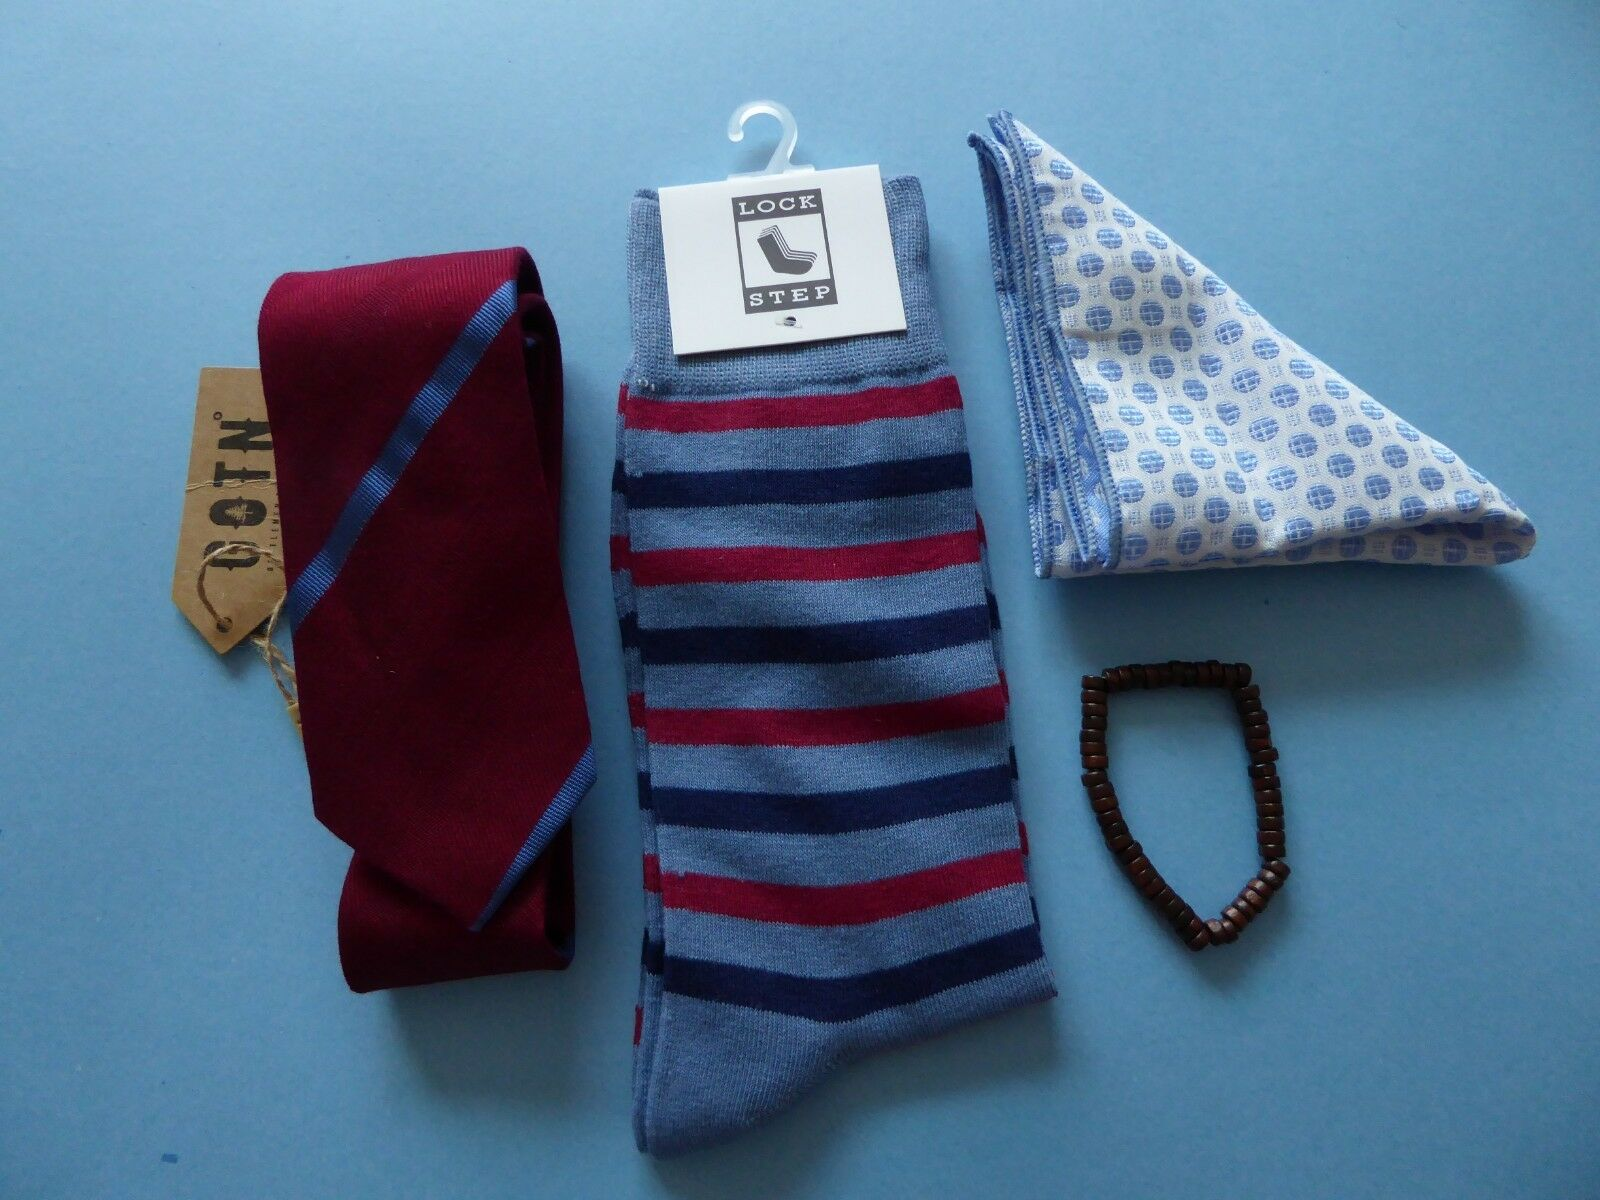 GOTN Burgundy Red Tie + Bracelet + Lock Step Sock + Soft Landing Pocket Square